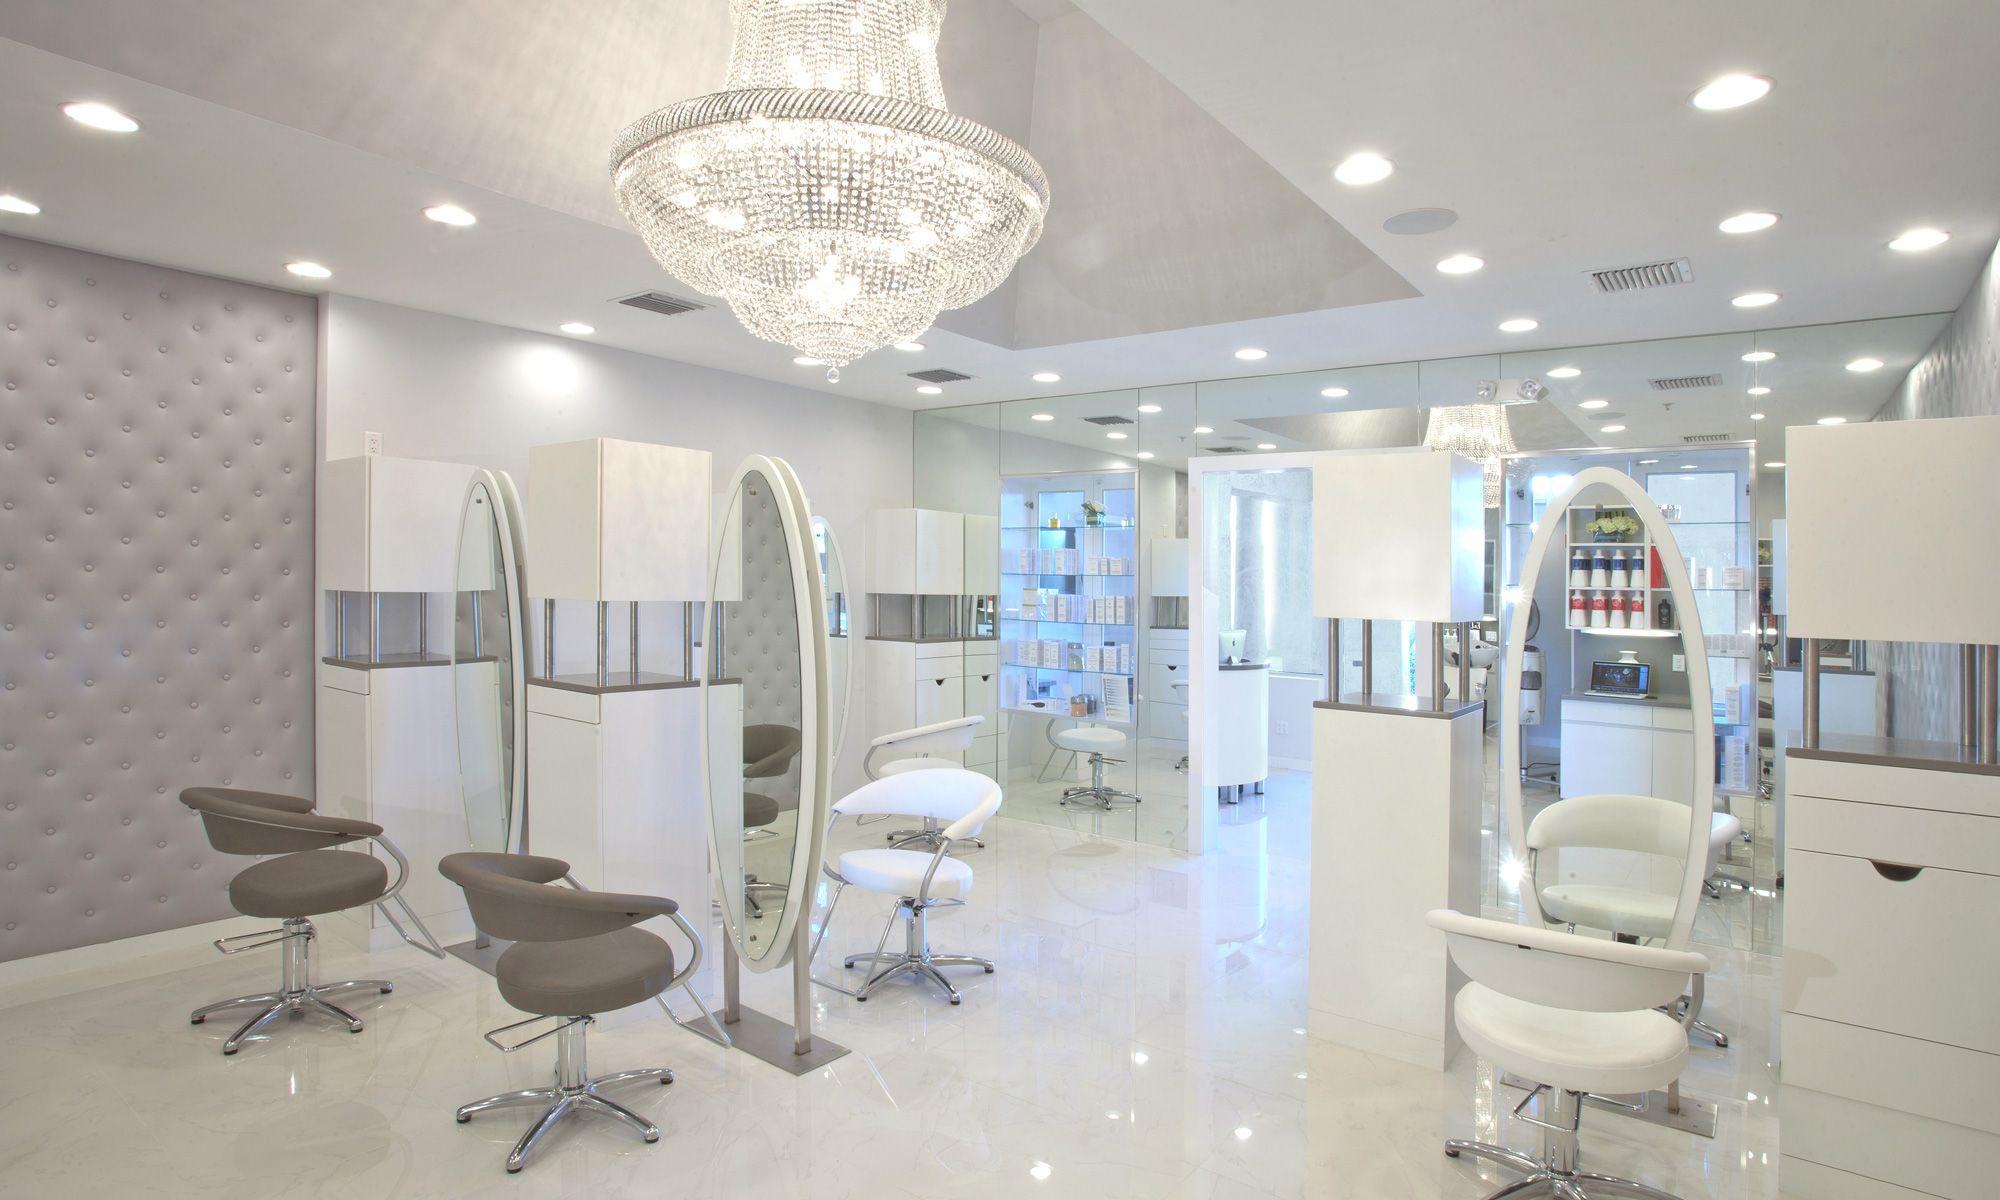 Home Spa Design Ideas: Danny-Jeluca-Salon-photo-by-Robin-Hill-(c)-HI-RES-(12